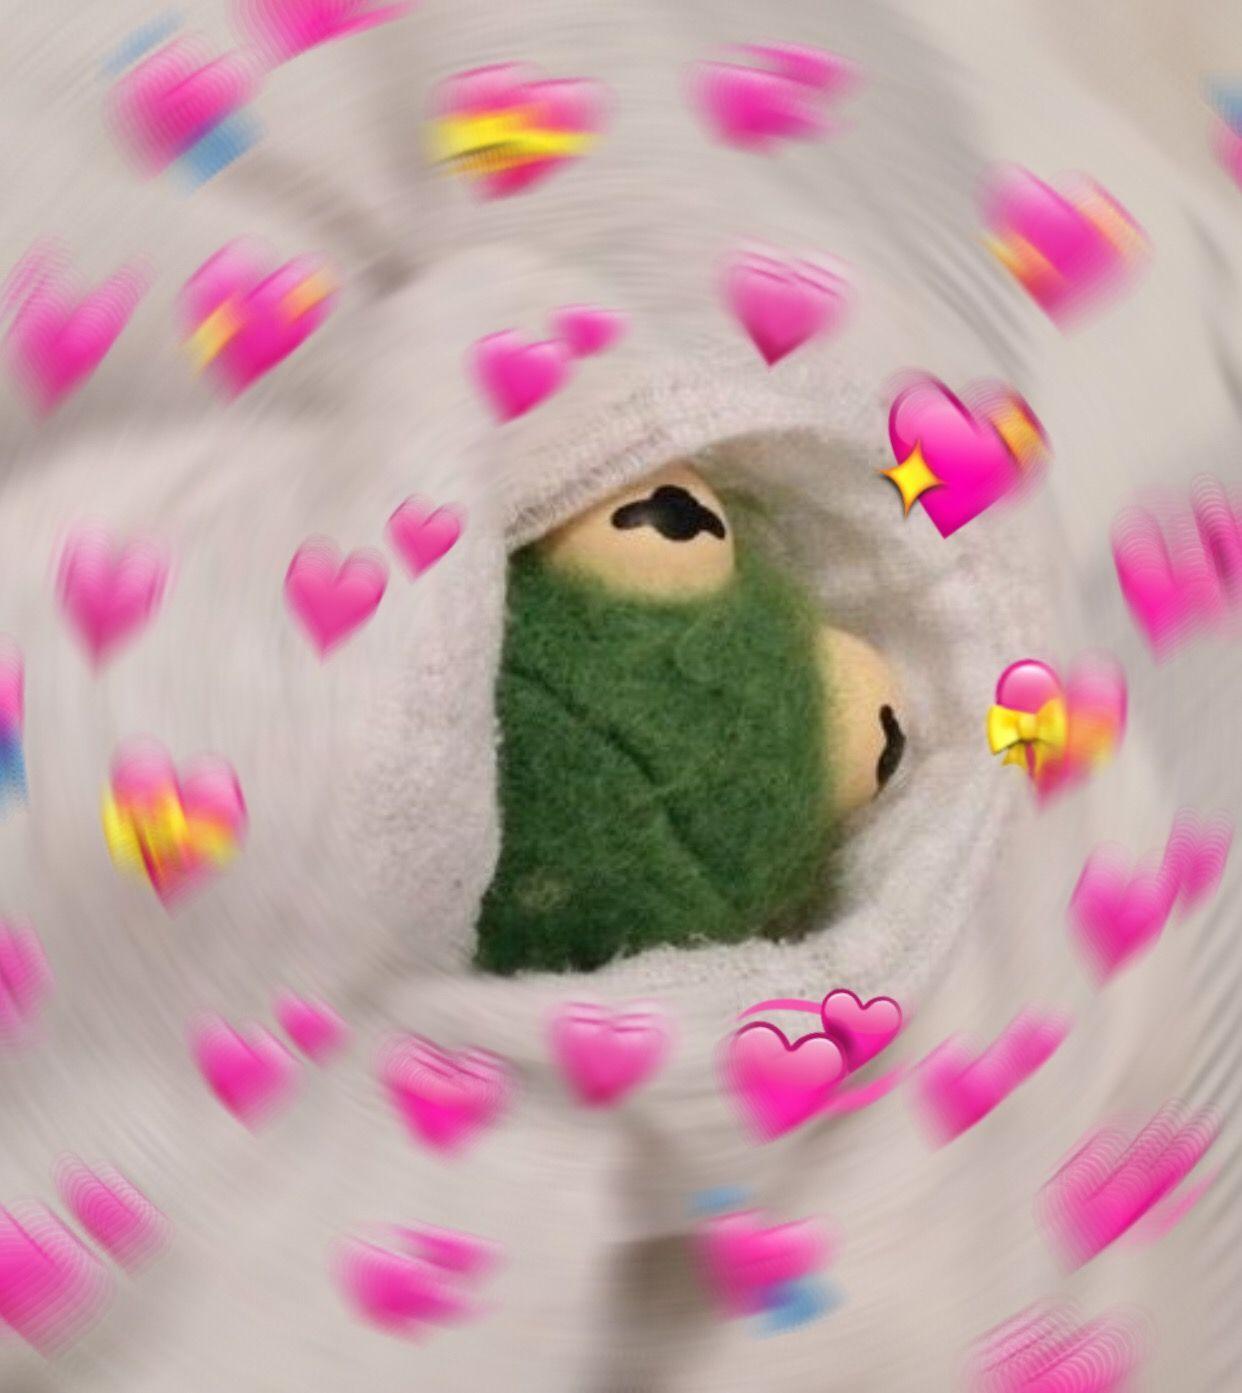 Meme Meme Meme Wallpaper Memewallpaper Tags Memehilarious Memefunny Memebrasileiros Memefaces Frog Wallpaper Wallpaper Iphone Cute Heart Emoji